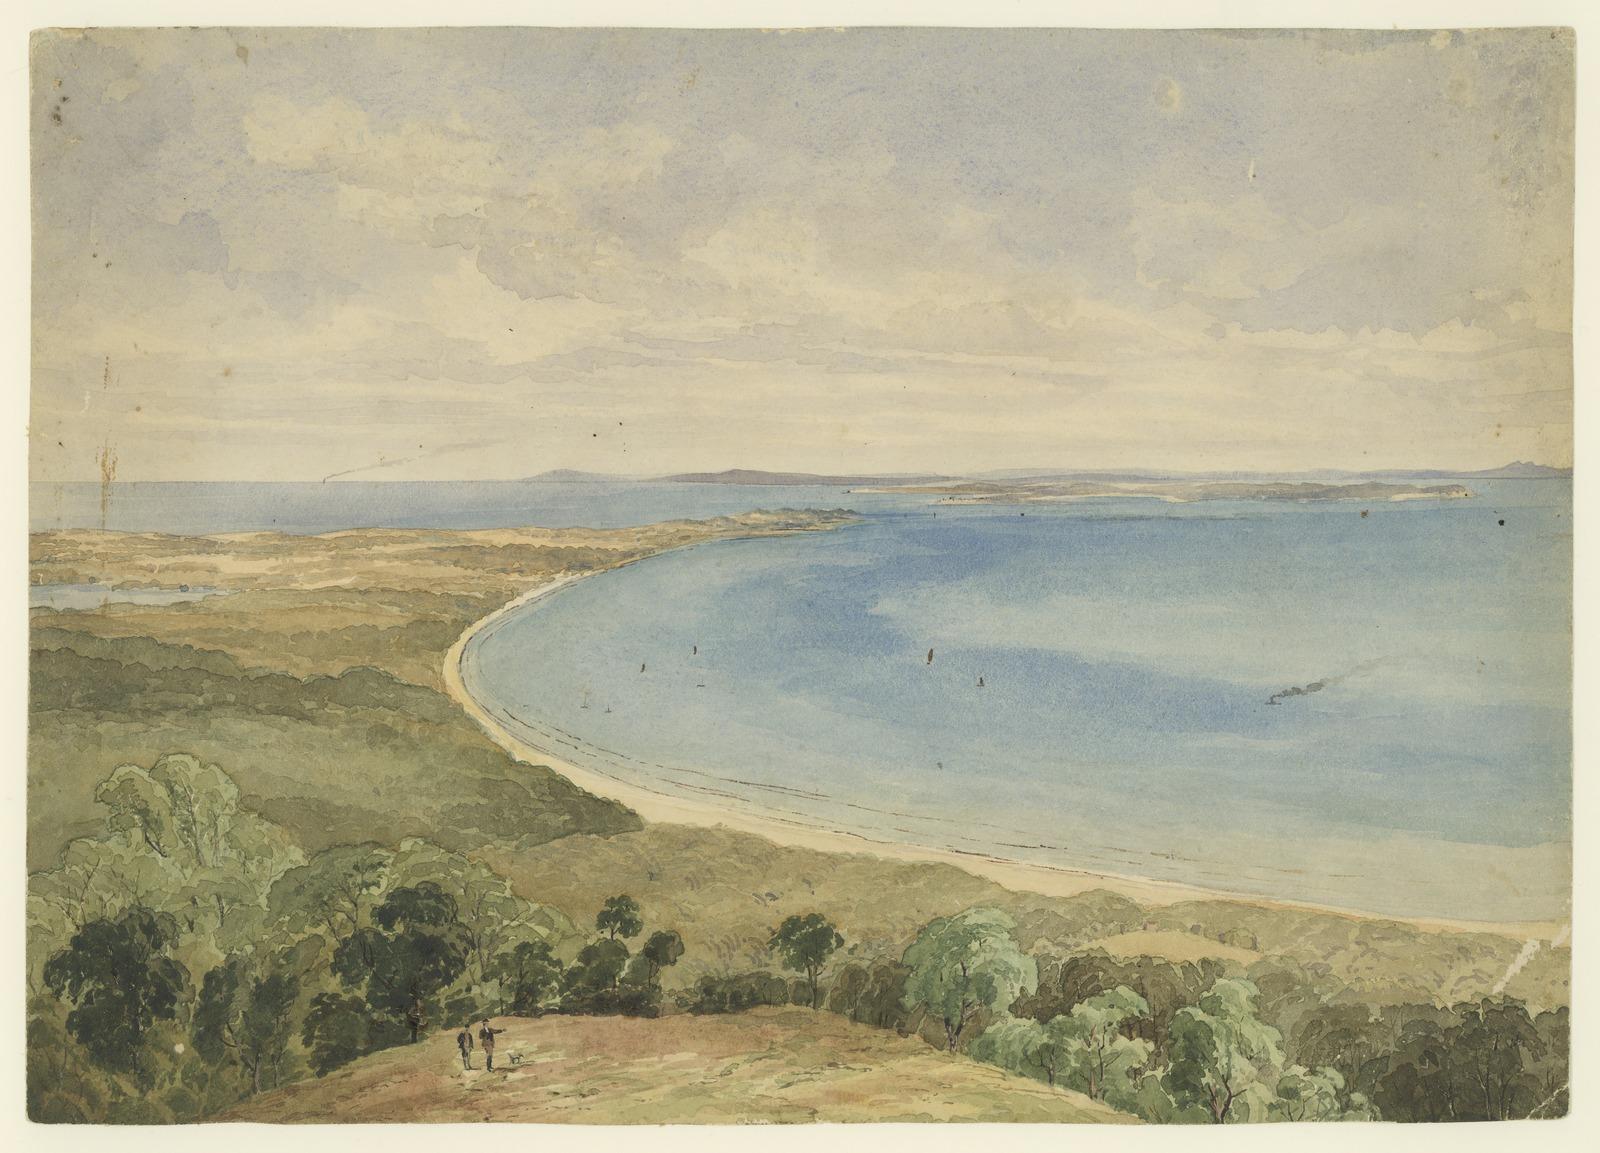 Image 2 Elevated view of unidentified coastline and ocean art original